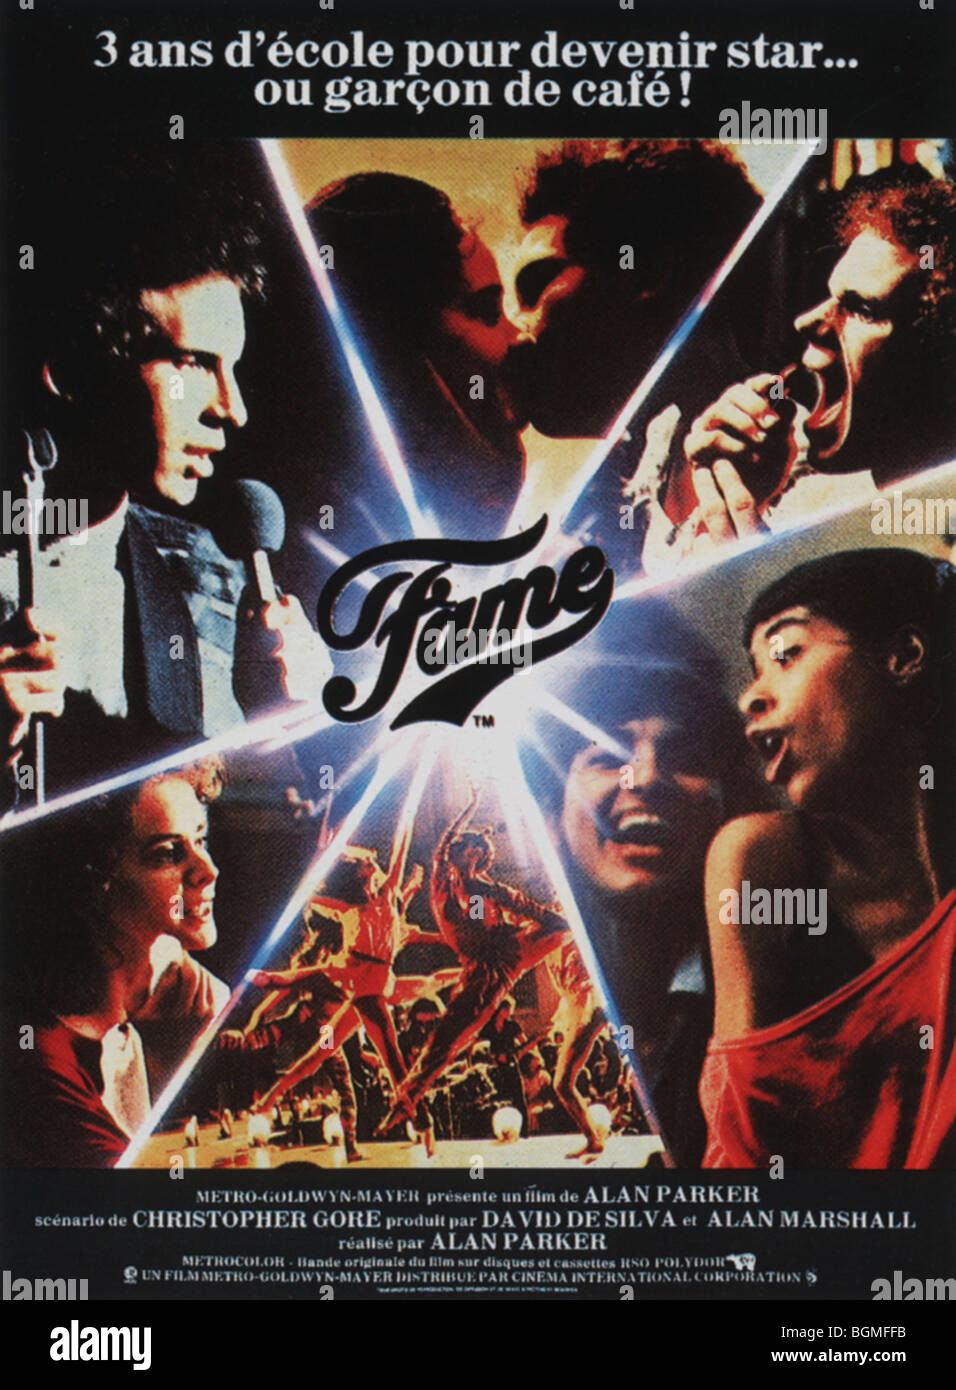 Fama Año : 1980 Gene Anthony Ray Director: Alan Parker póster de película (Fr) Imagen De Stock